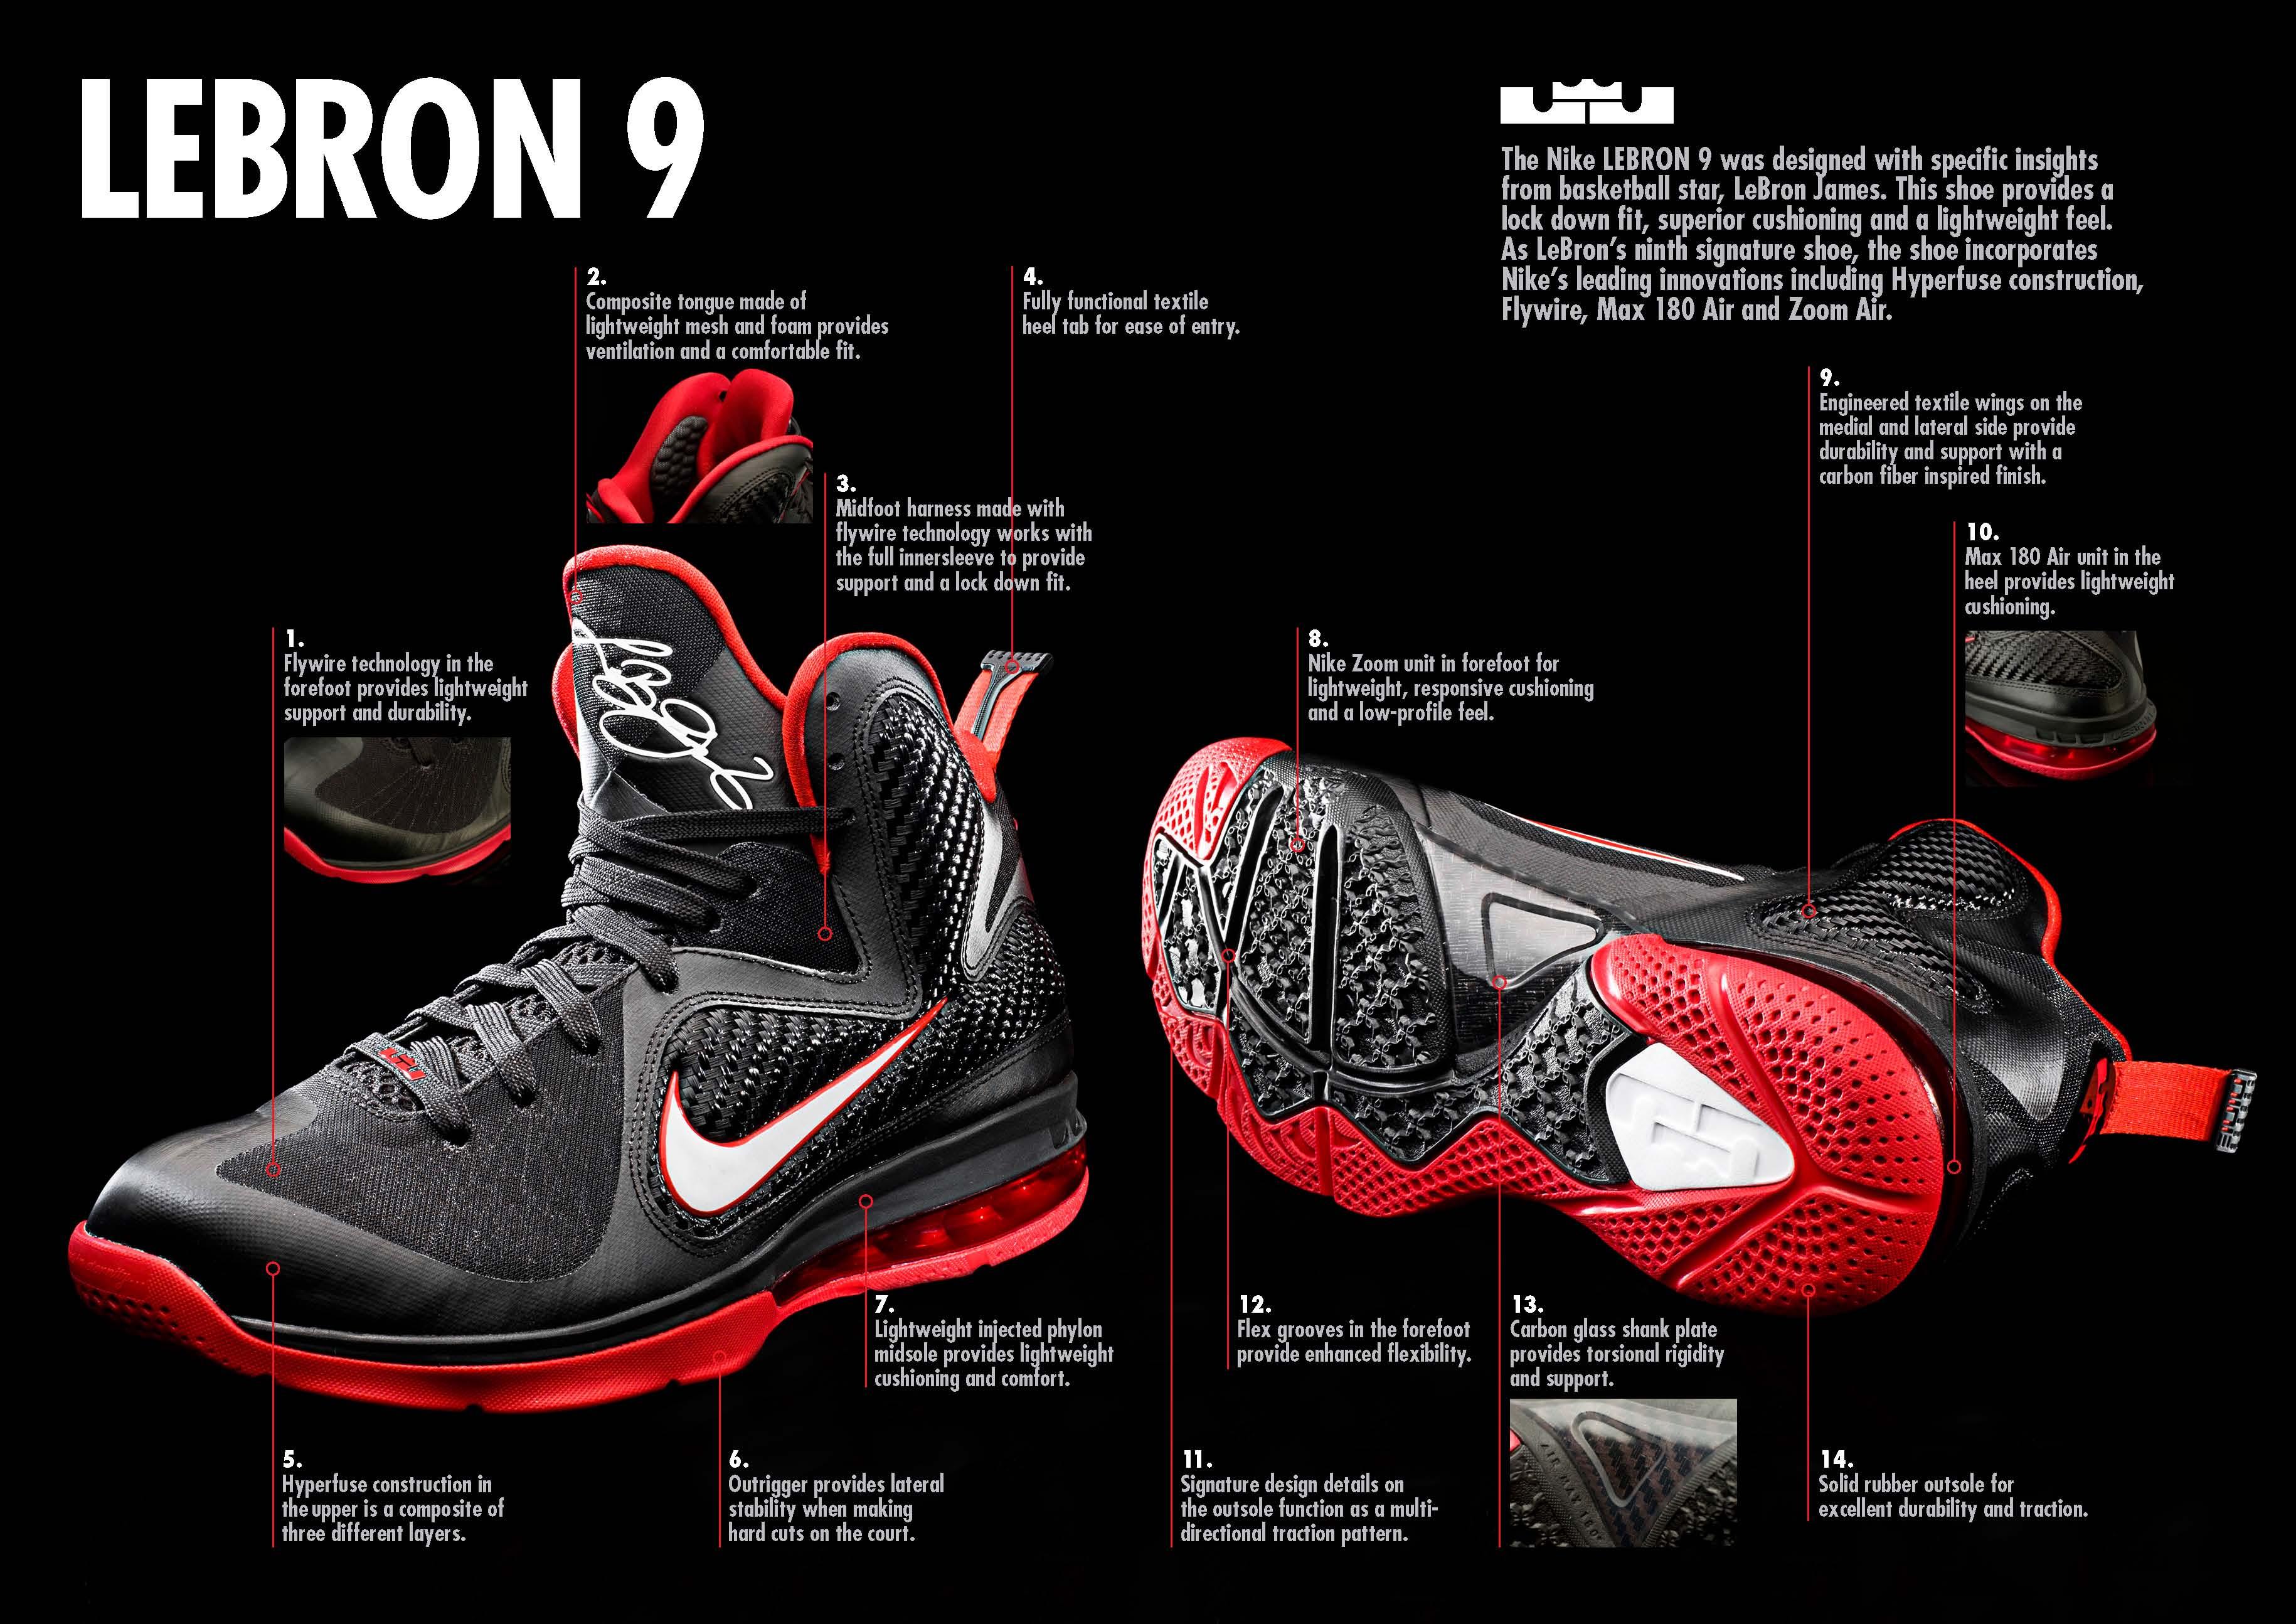 Lebron 9 Concept